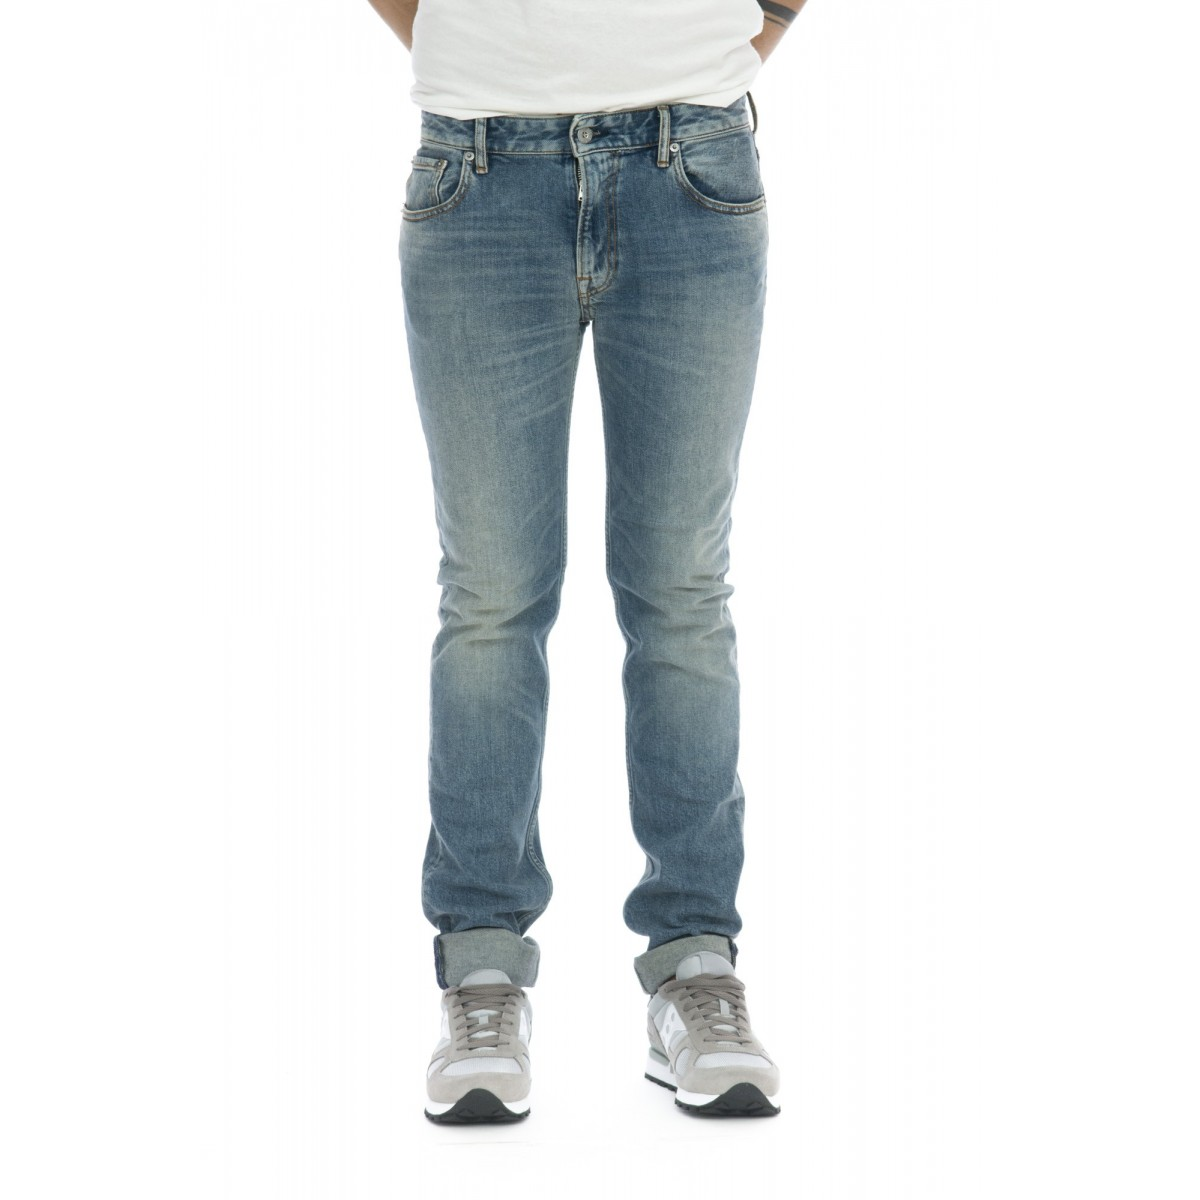 Jeans - J2zg5 jeans skinny lavato